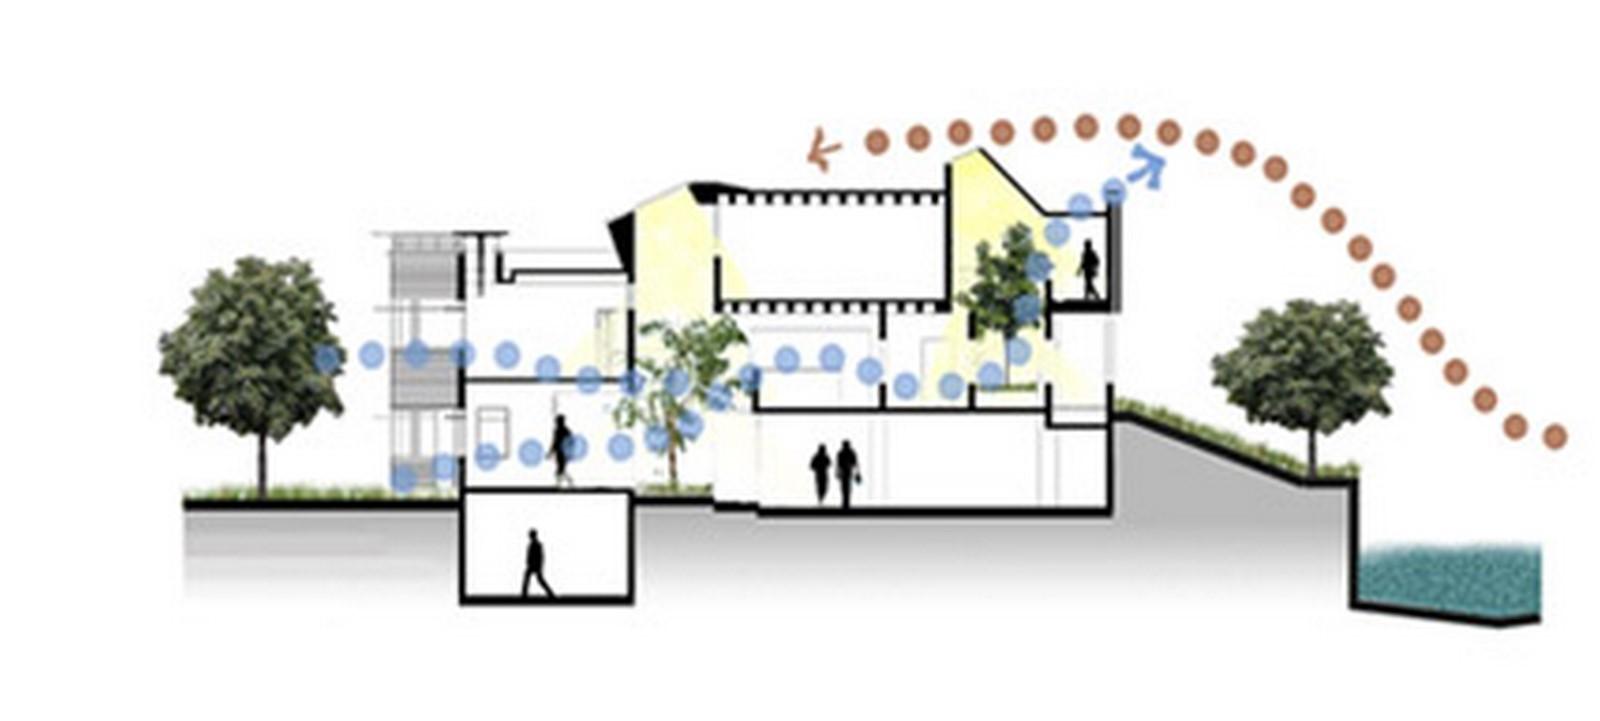 An insight into green buildings - Sheet8